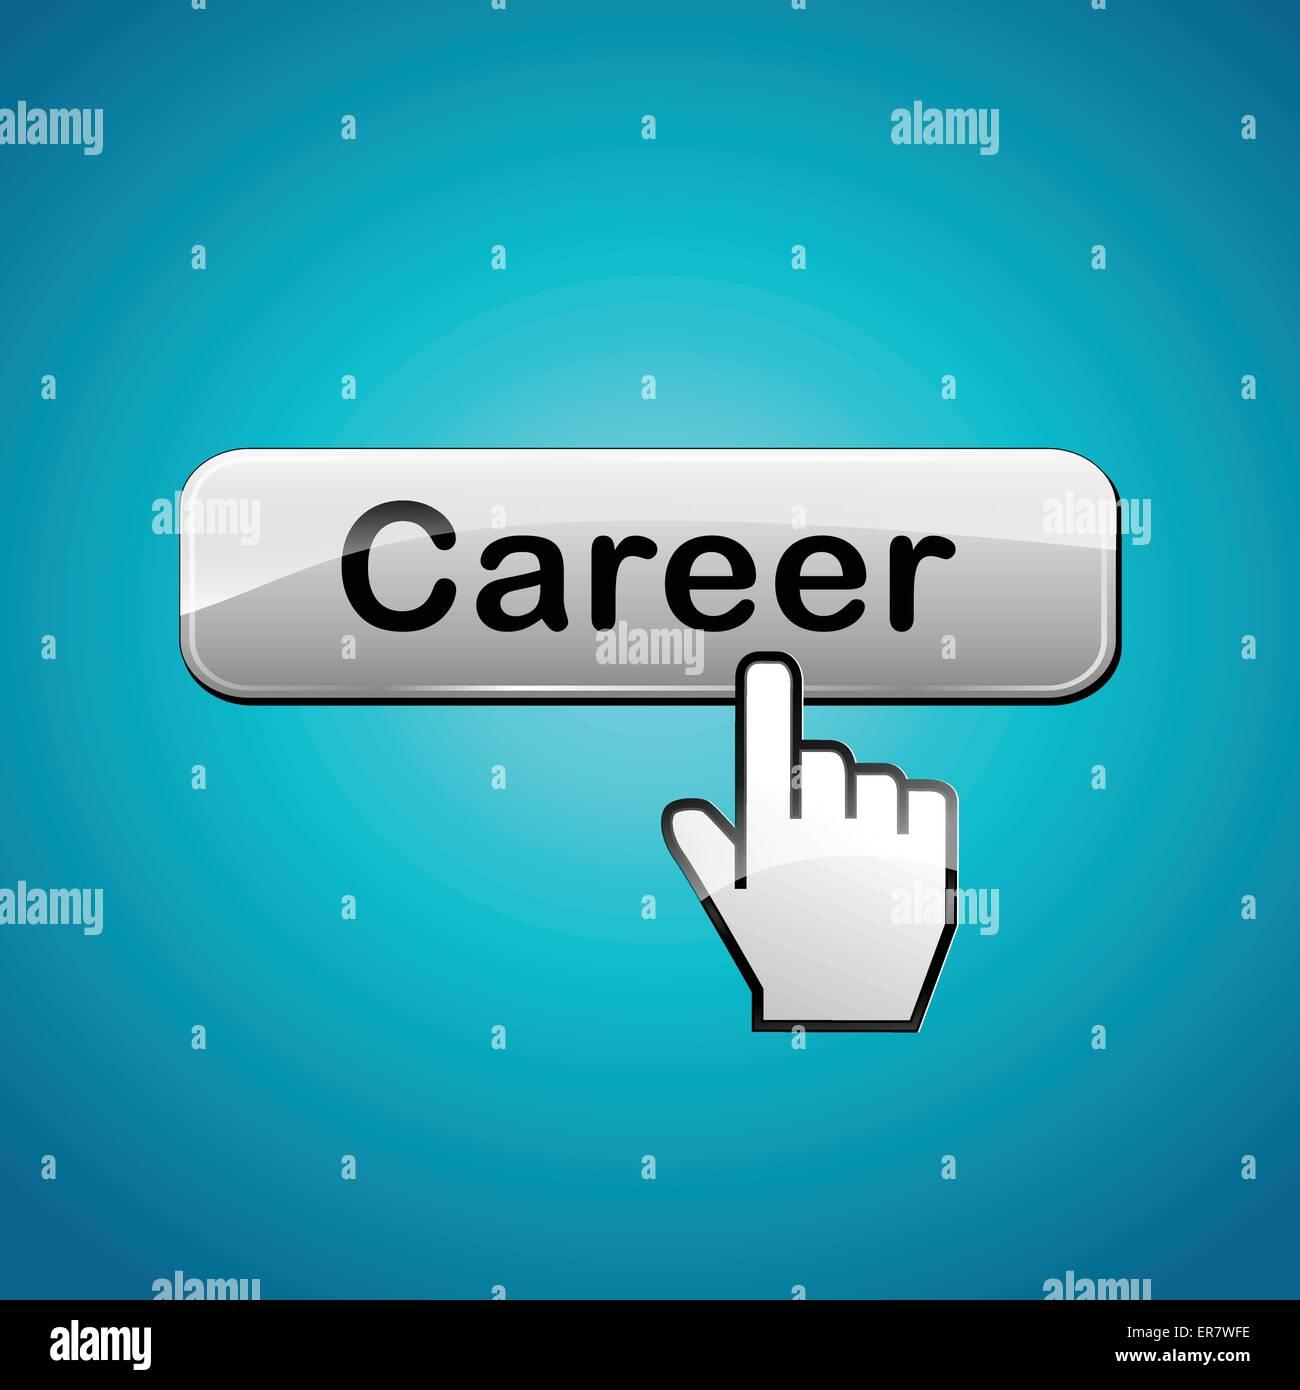 Vector illustration of career web button concept - Stock Vector